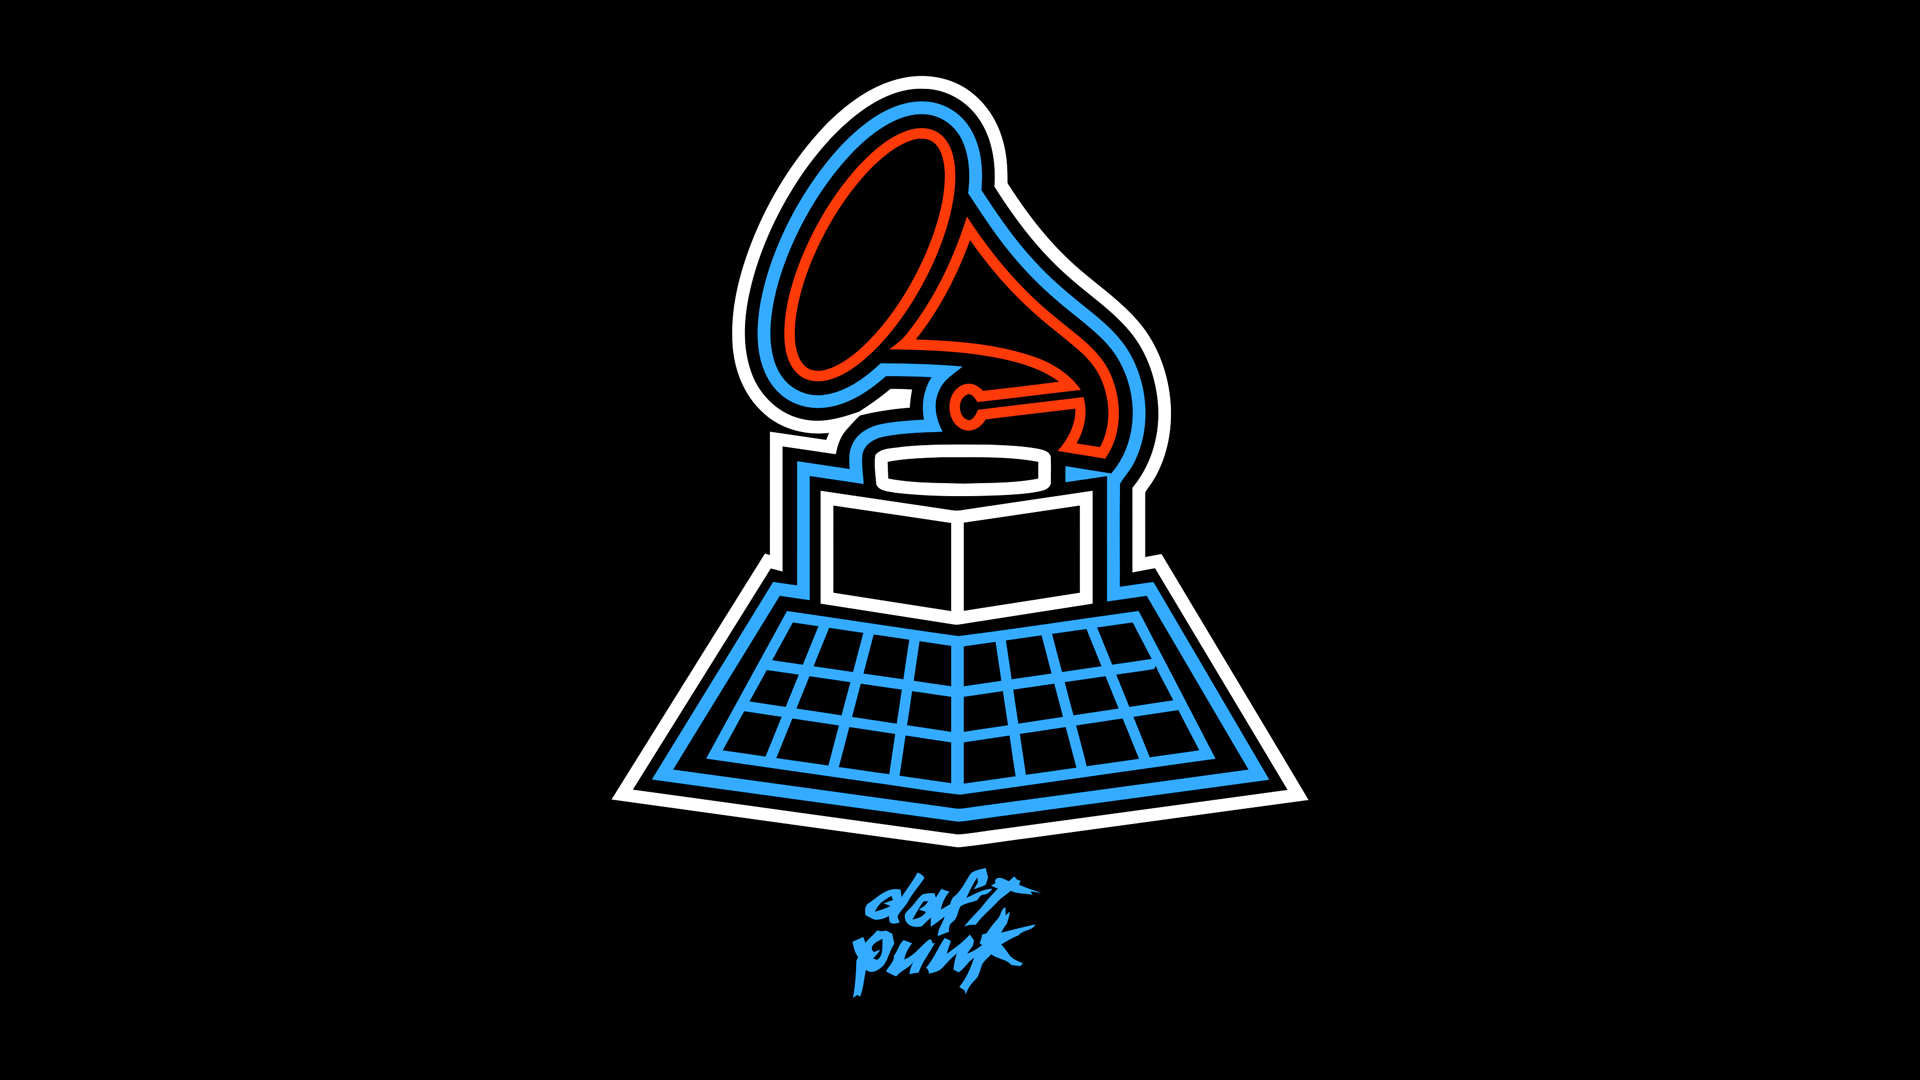 Archive of Hi-Res Daft Punk Album Art - Page 4   The Daft ...